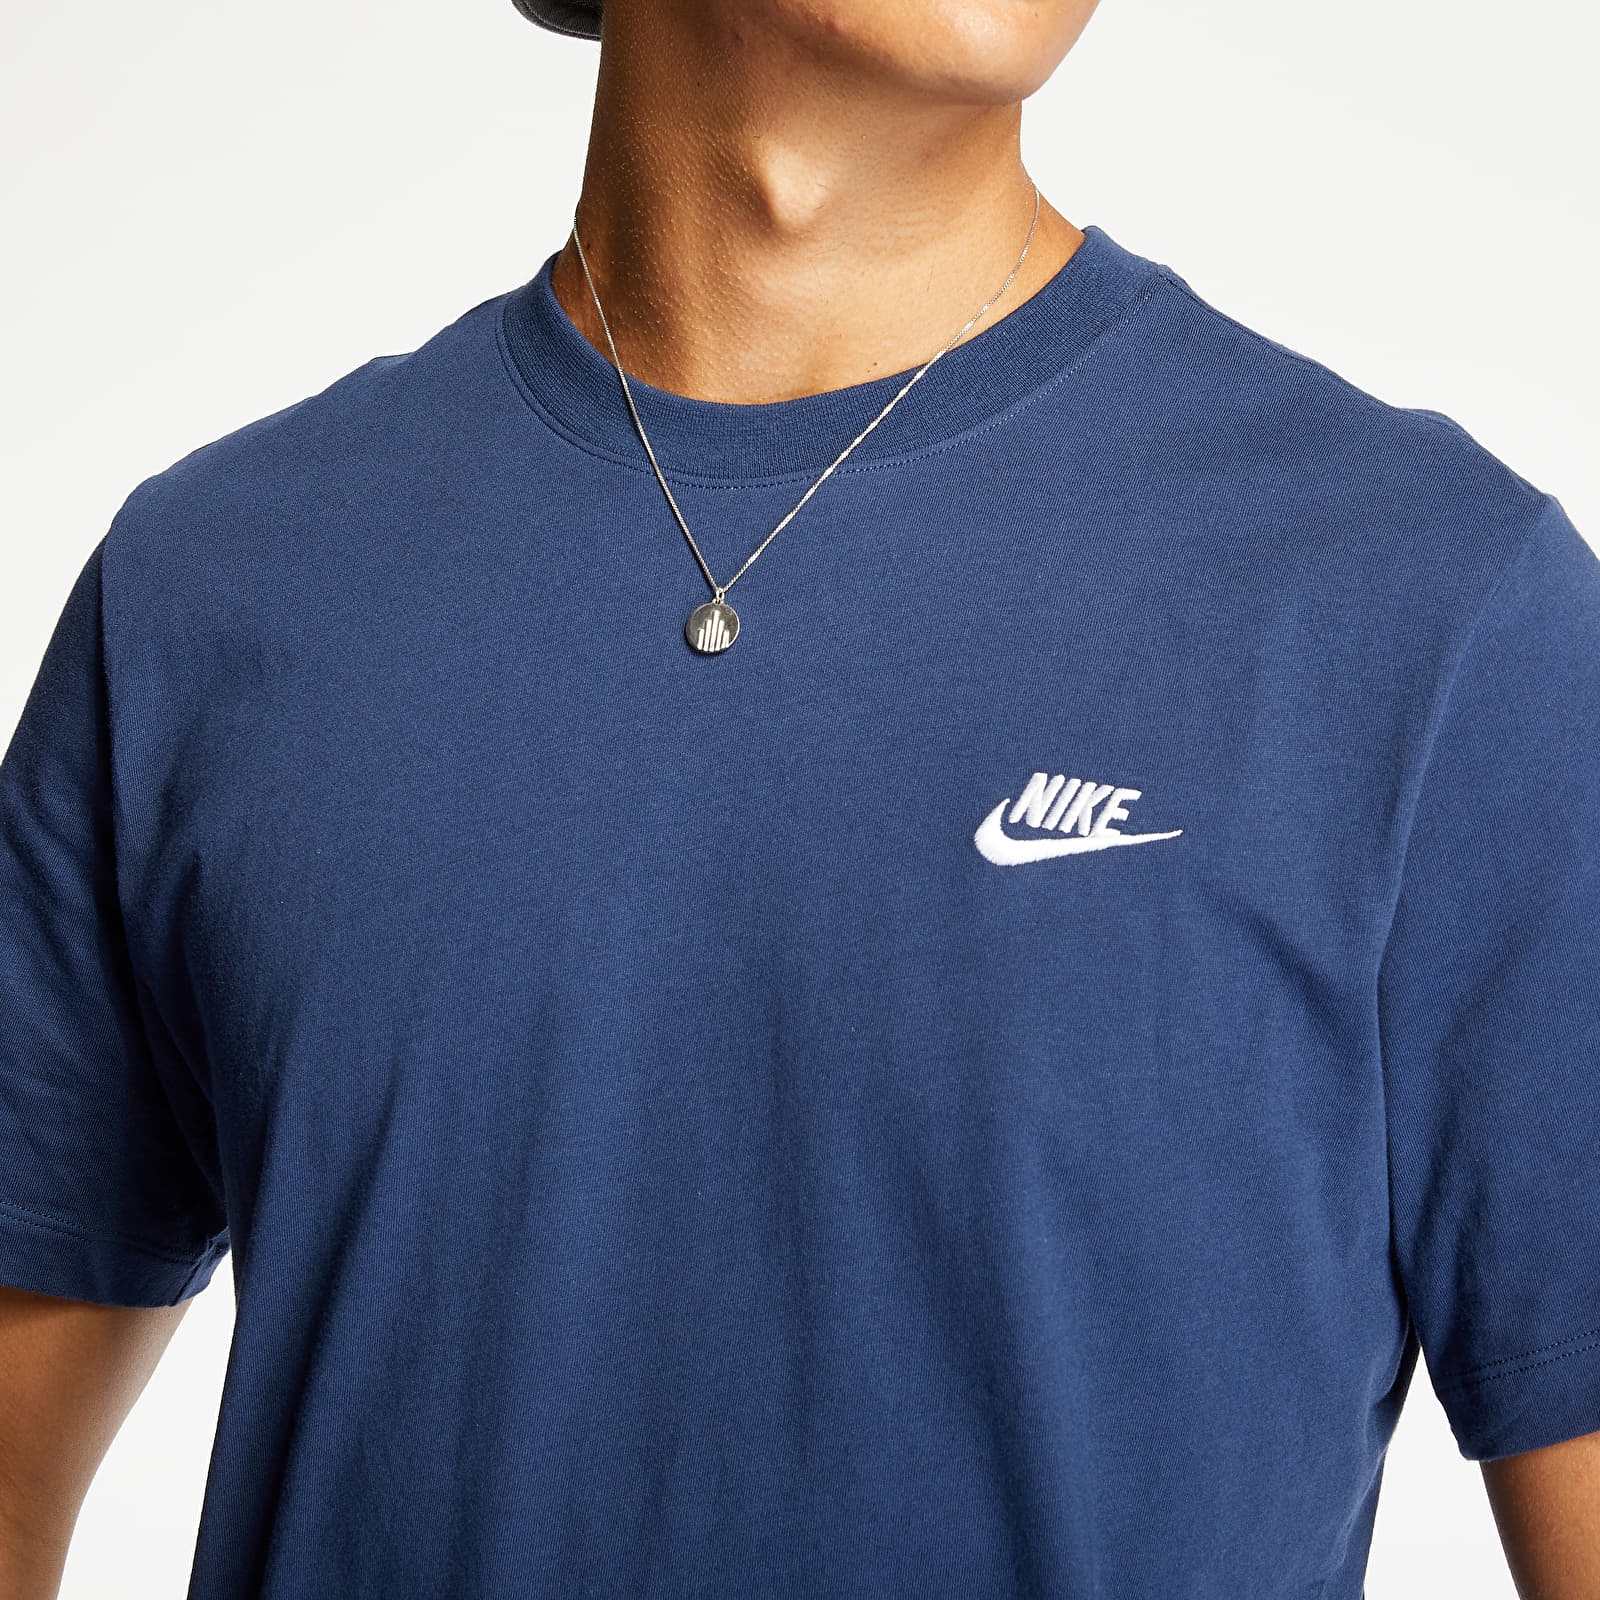 Nike Sportswear Club Tee Midnight Navy, Blue